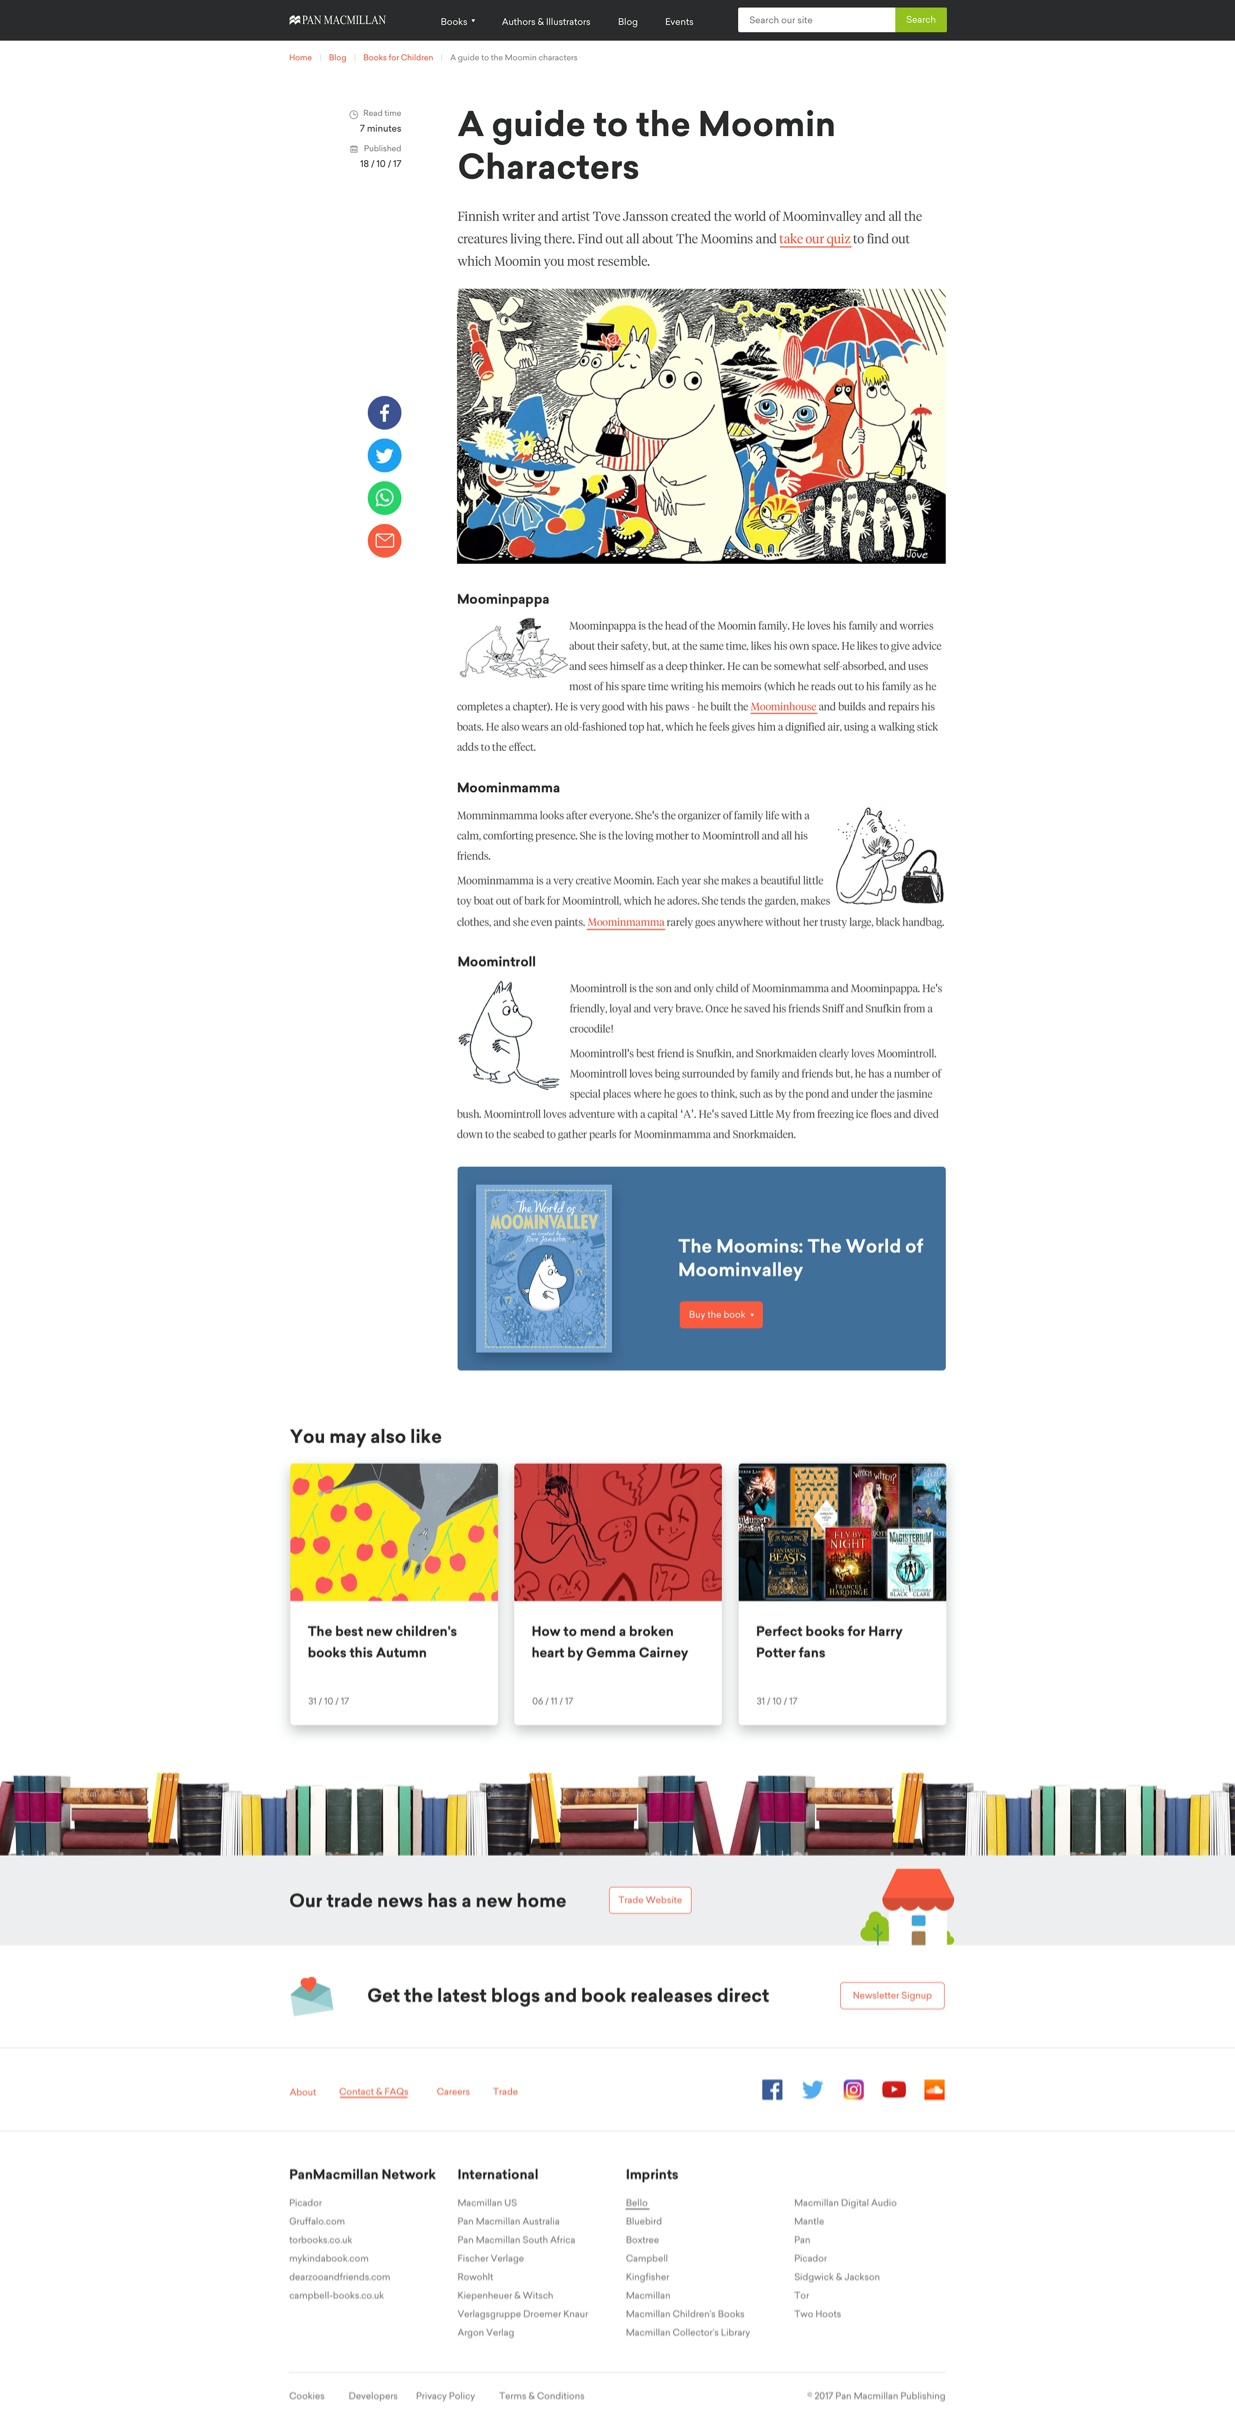 PanMac - Guide to Moomins Blog